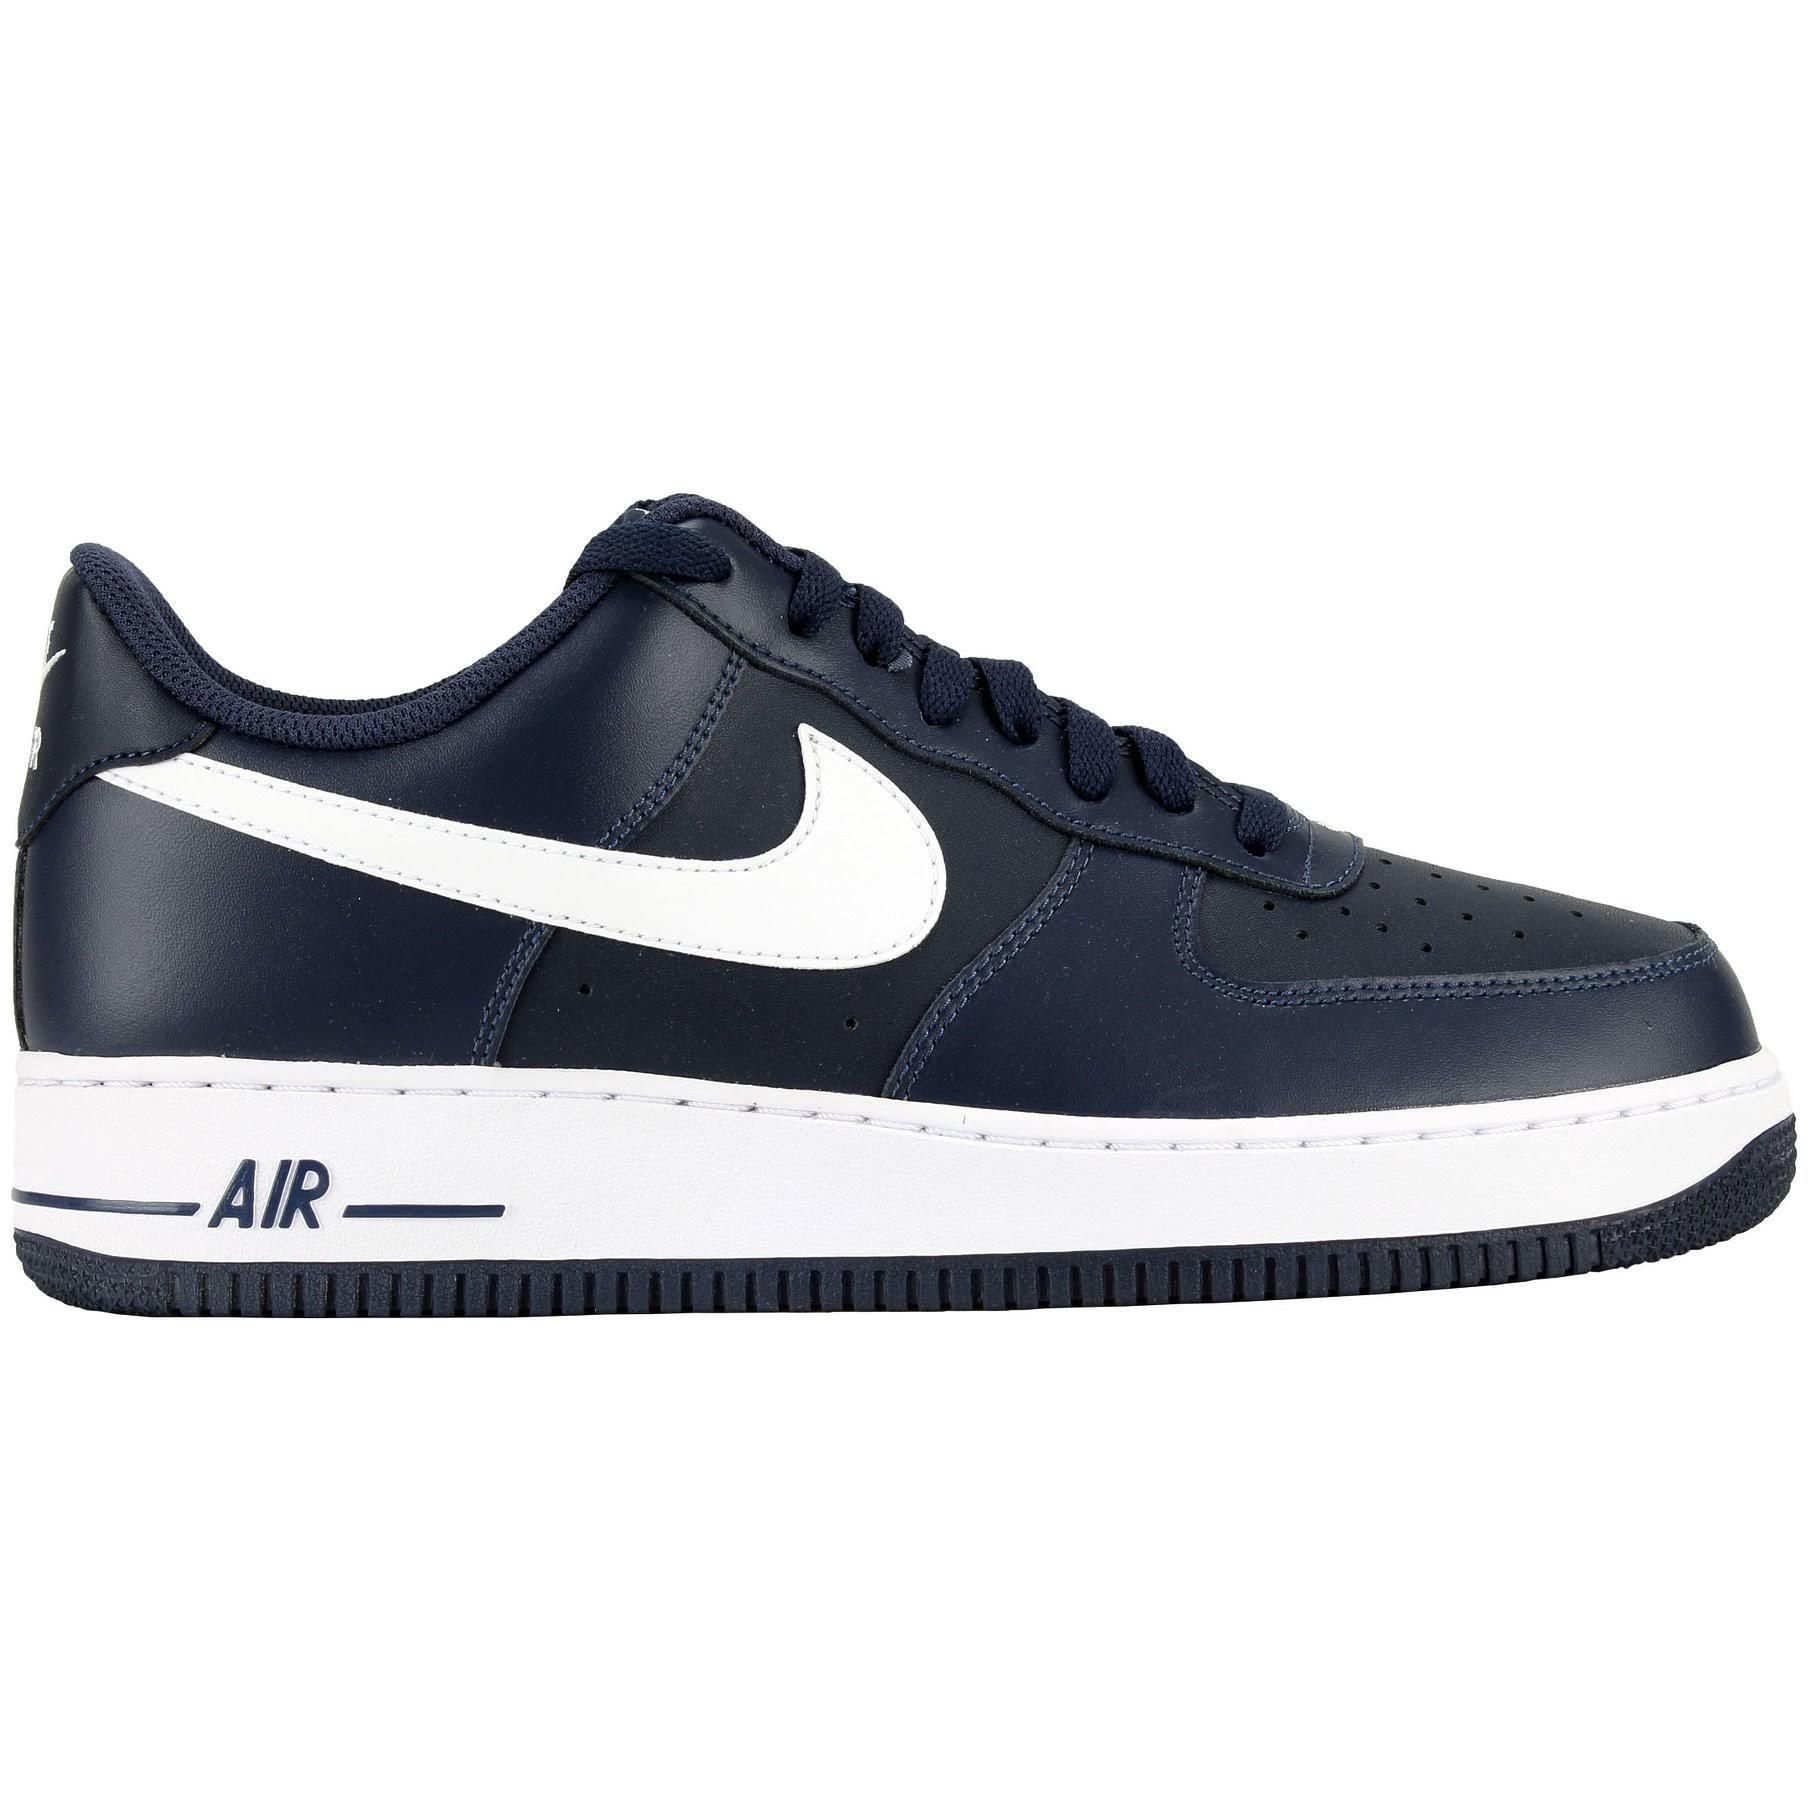 Deporte 1 5 Zapatillas Air Force Nike Tamaño 'midnight Para Navy' 11 De Hombre qxaCaB5w4